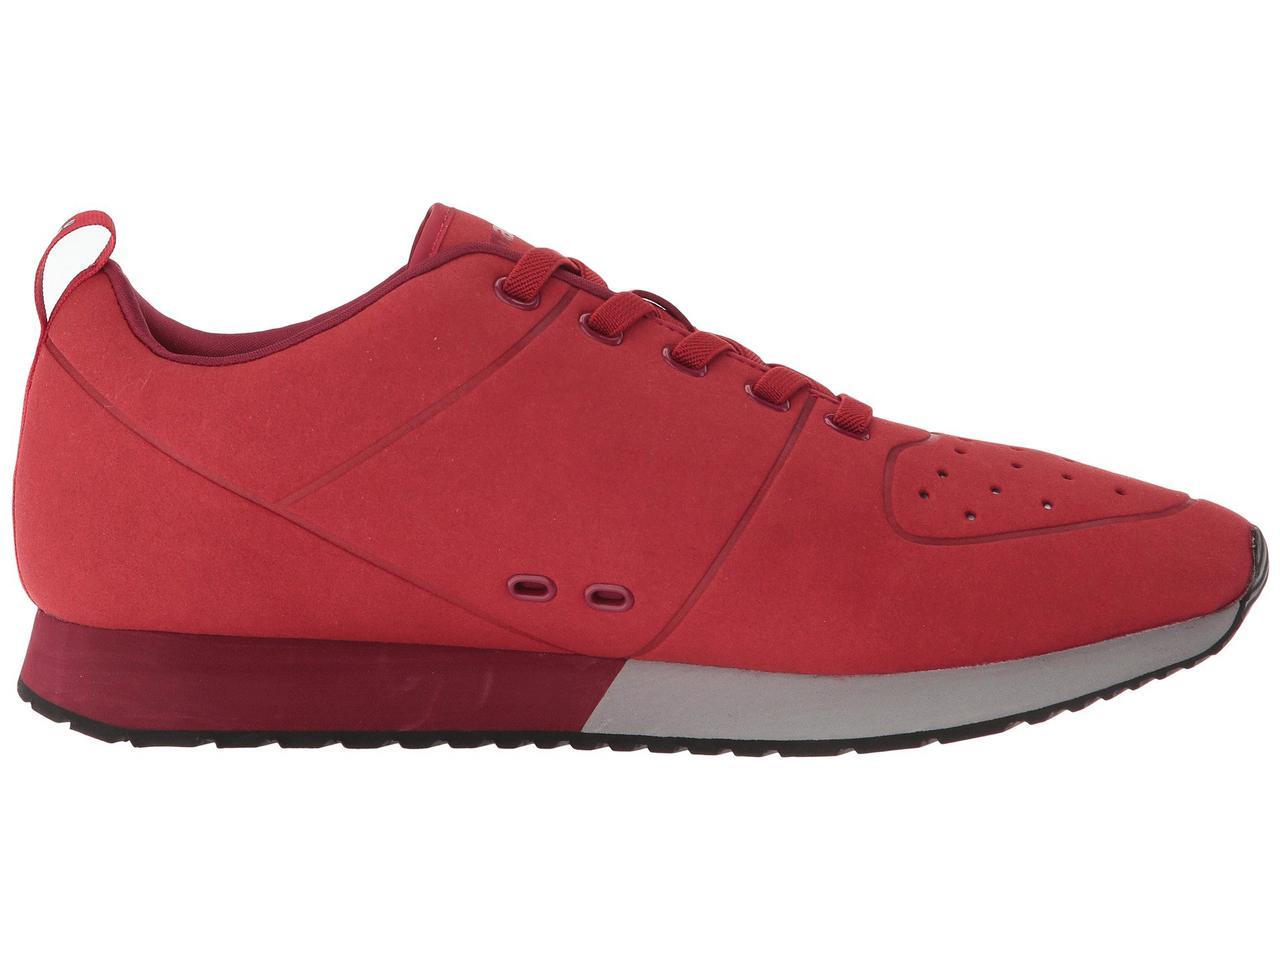 83a1d0467 Кроссовки/Кеды (Оригинал) Native Shoes Cornell Ski Patrol Red/Pigeon Grey/Root  Red/Jiffy Rubber, цена 2 330 грн., купить Київ — Prom.ua (ID#744620881)